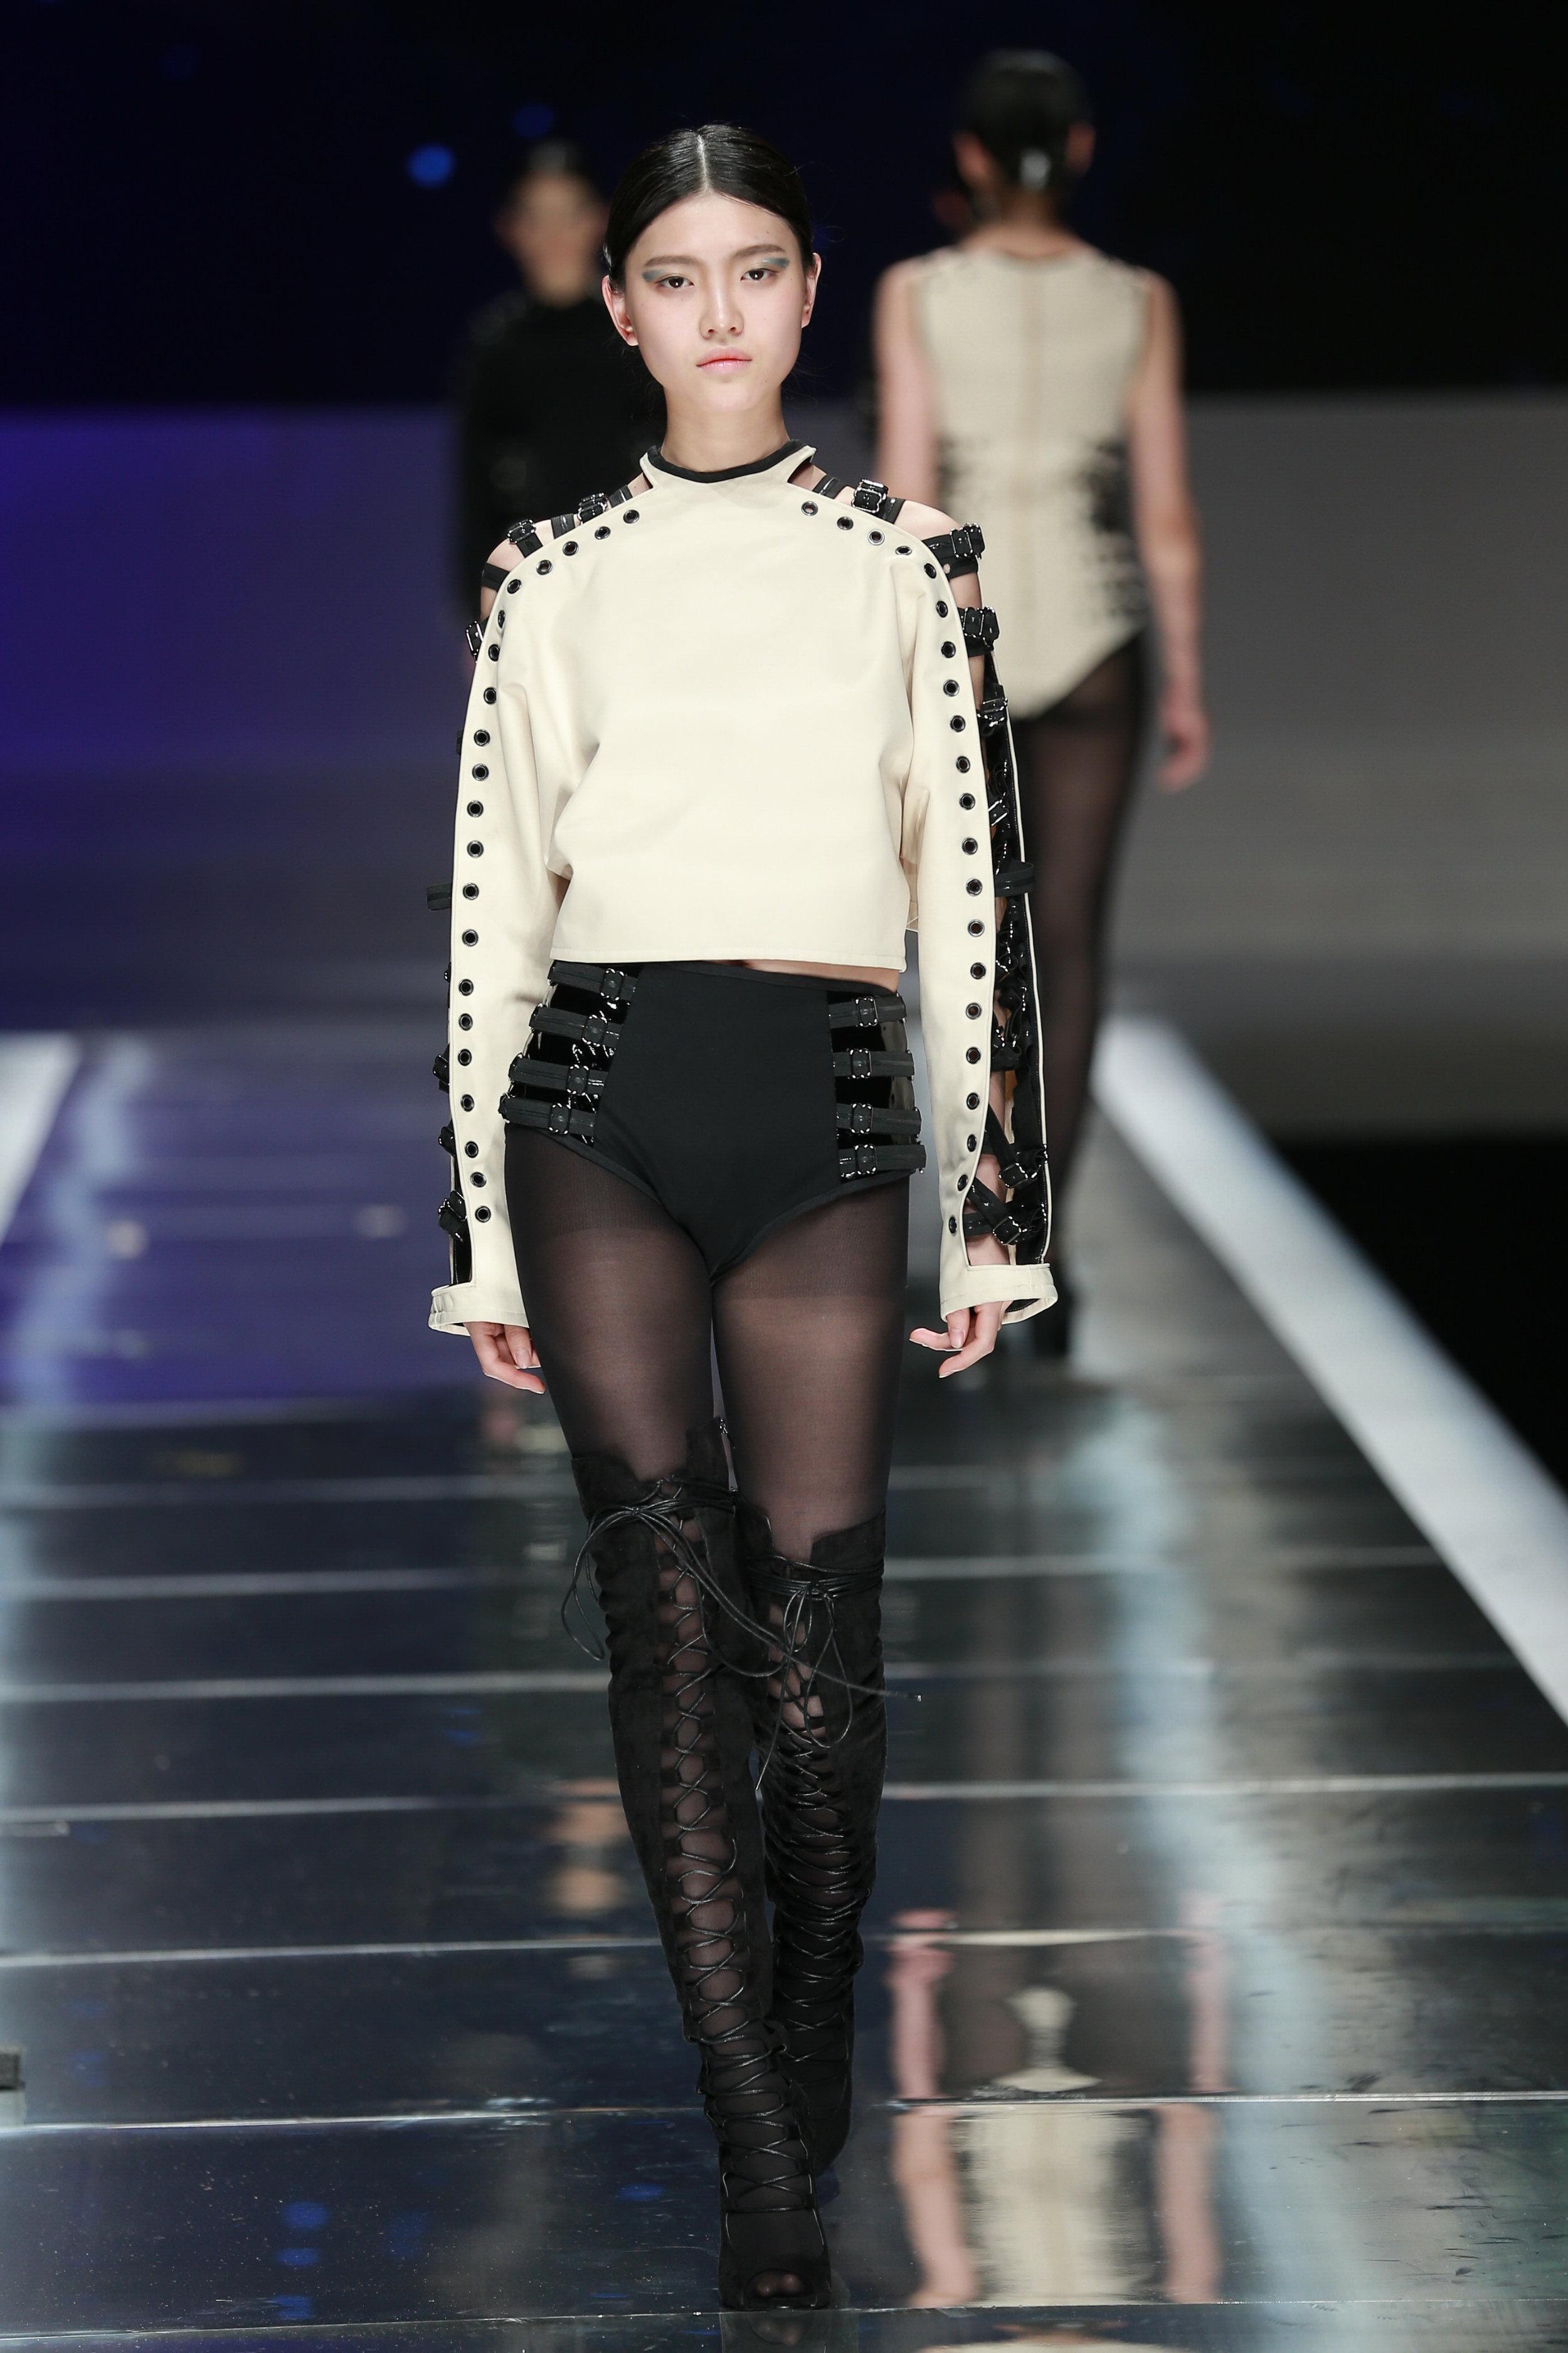 China-Look3-Blouse-Short-Fashion-Week-Show.JPG